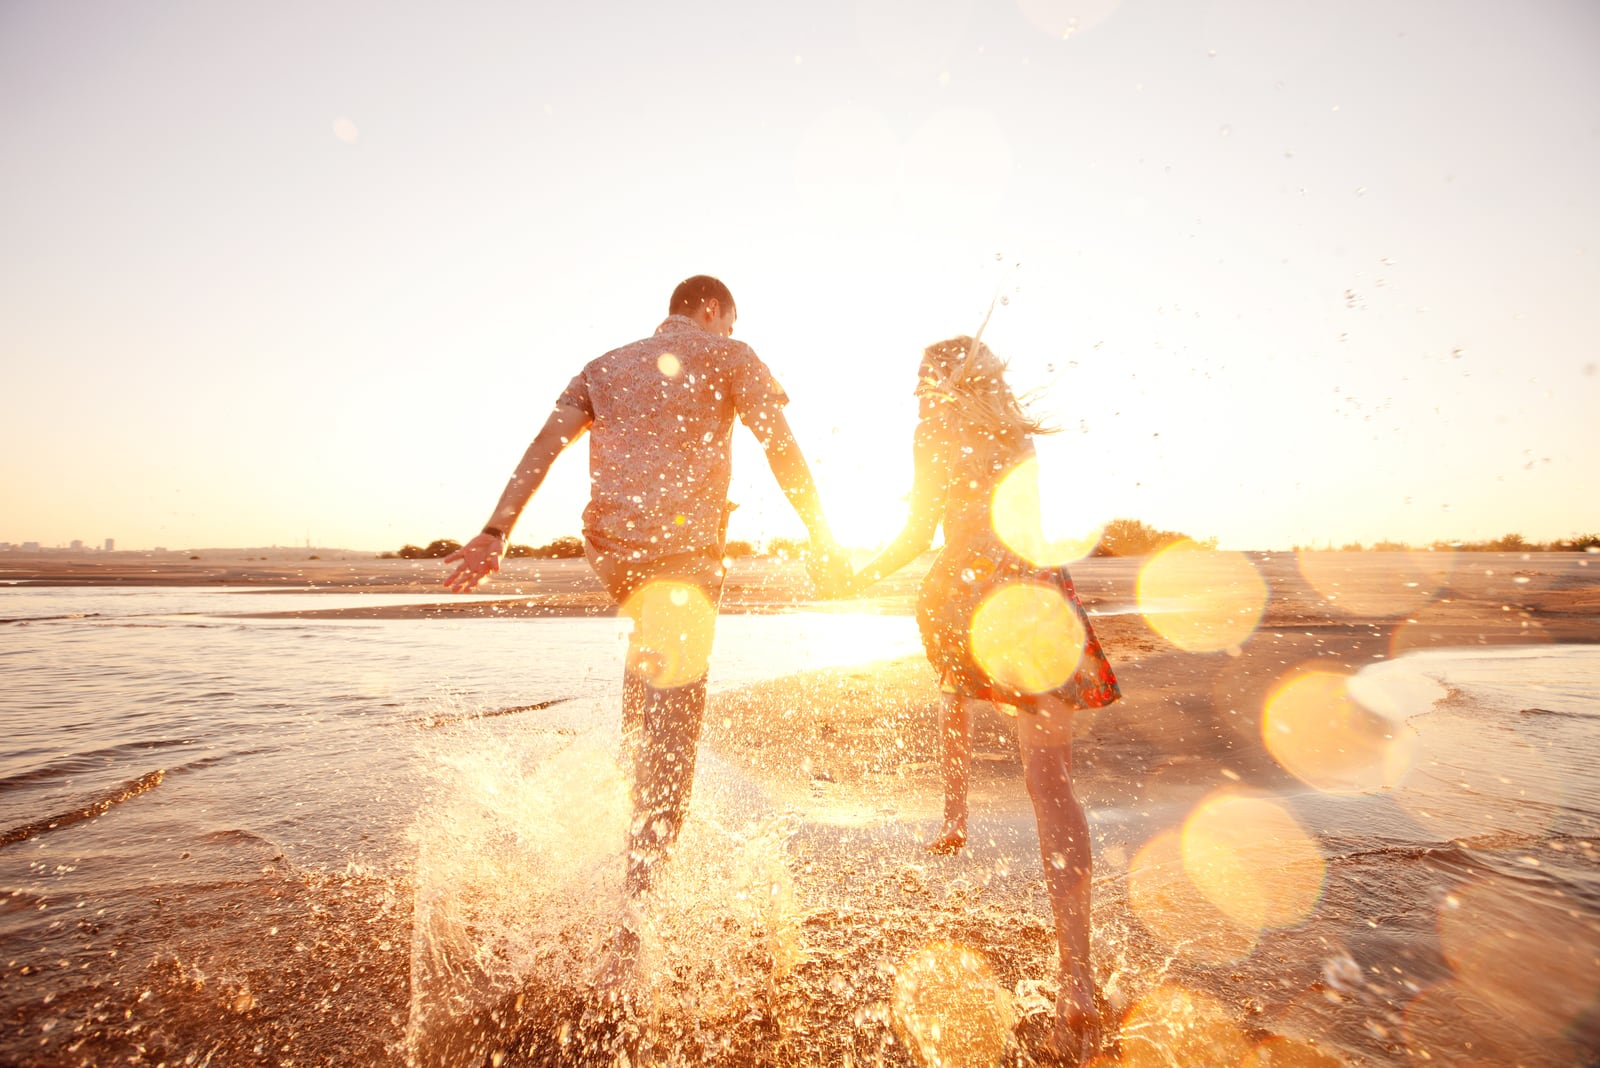 a man and a woman run along the beach holding hands